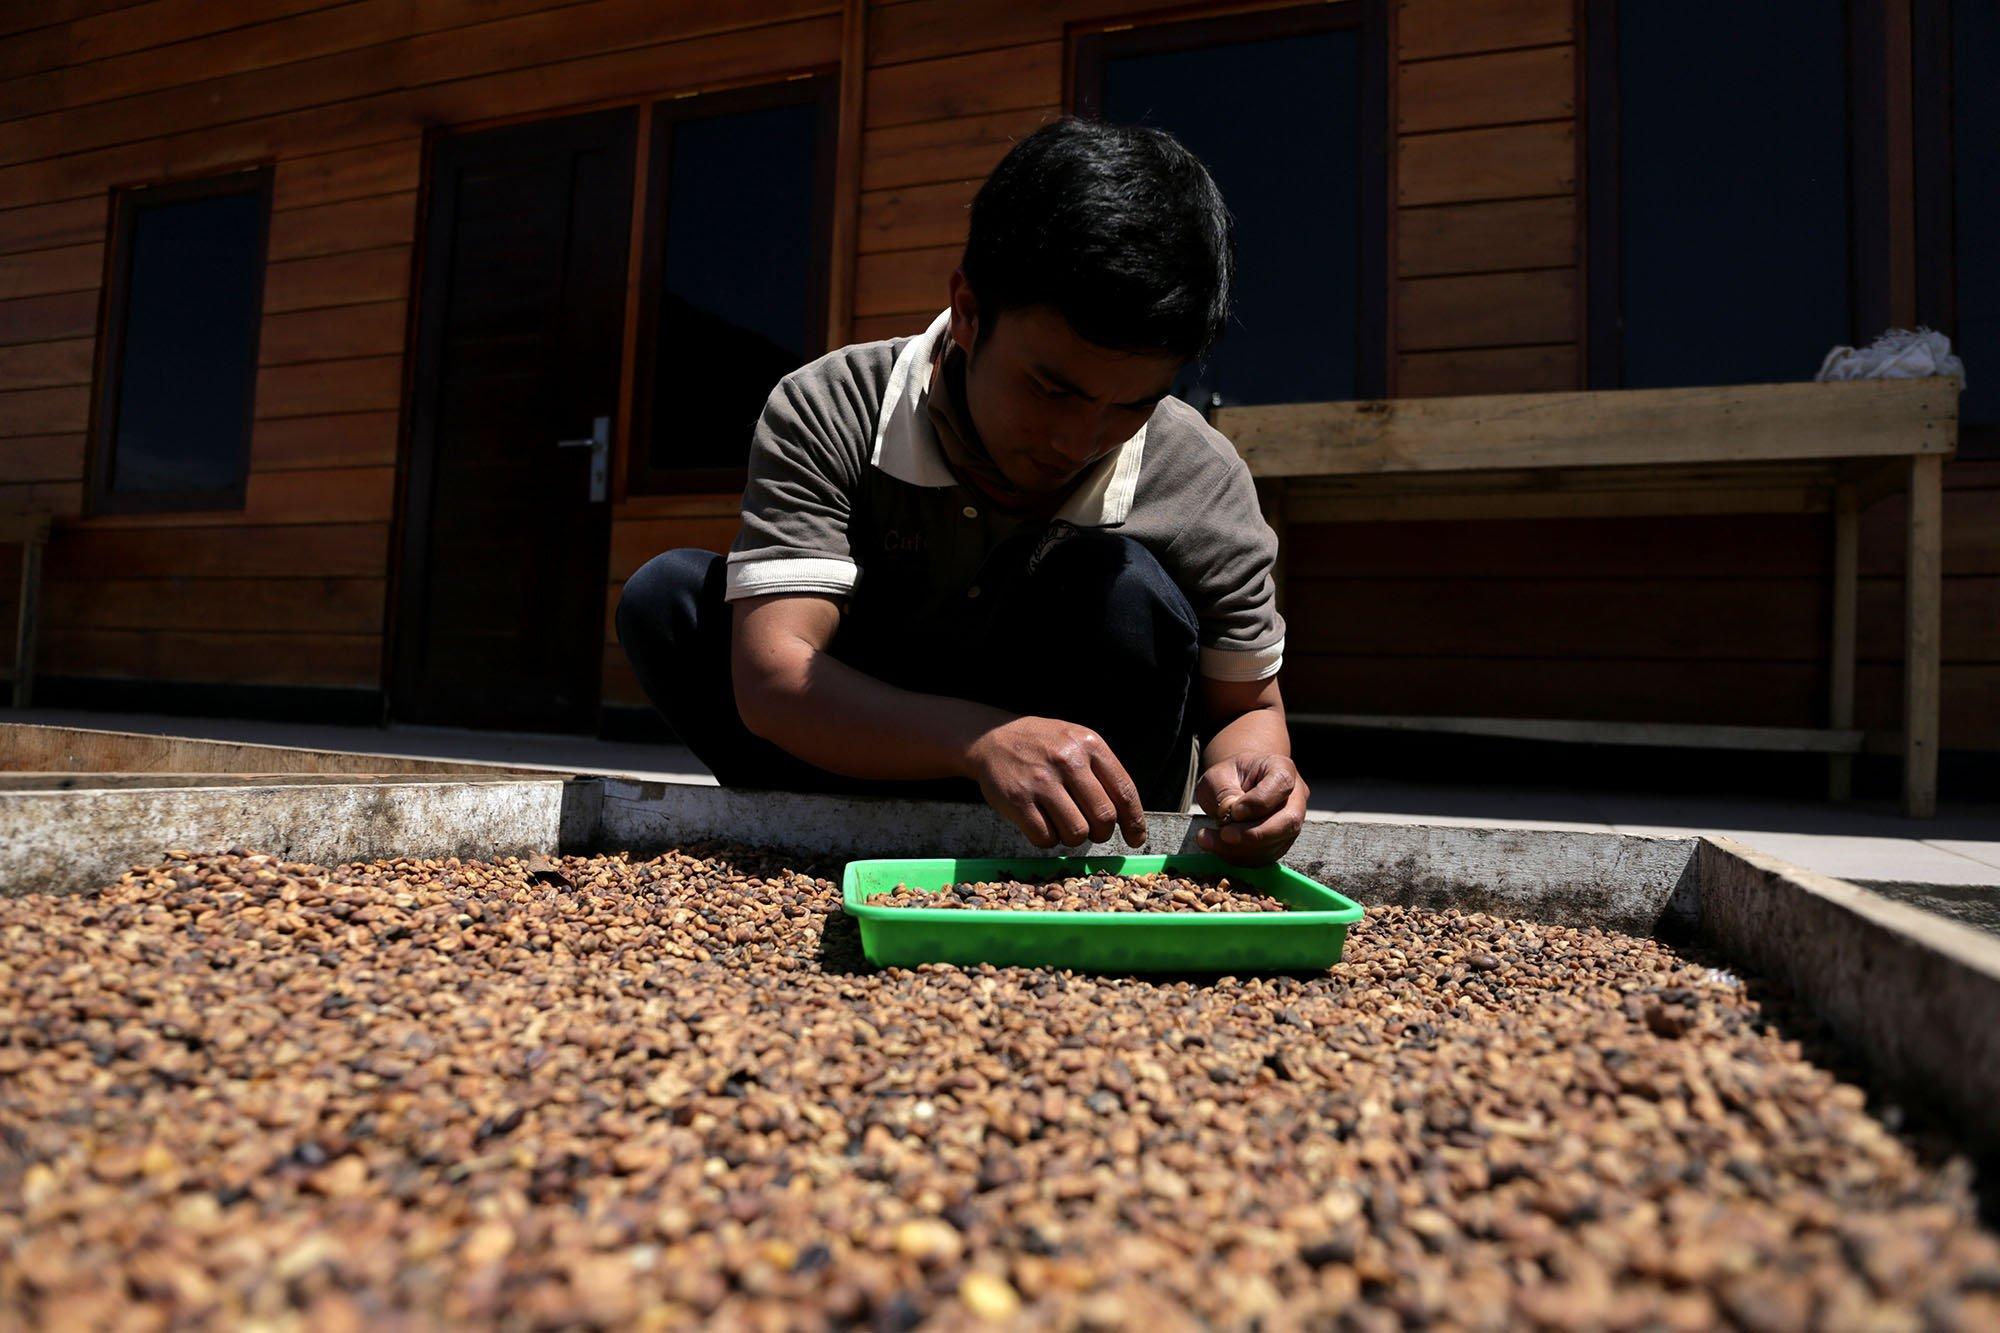 Pekerja Mountain Malabar Coffee memilih dan menyortir biji kopi yang berkualitas baik di pegunungan Malabar, Bandung, Jawa Barat (15/11/2019).